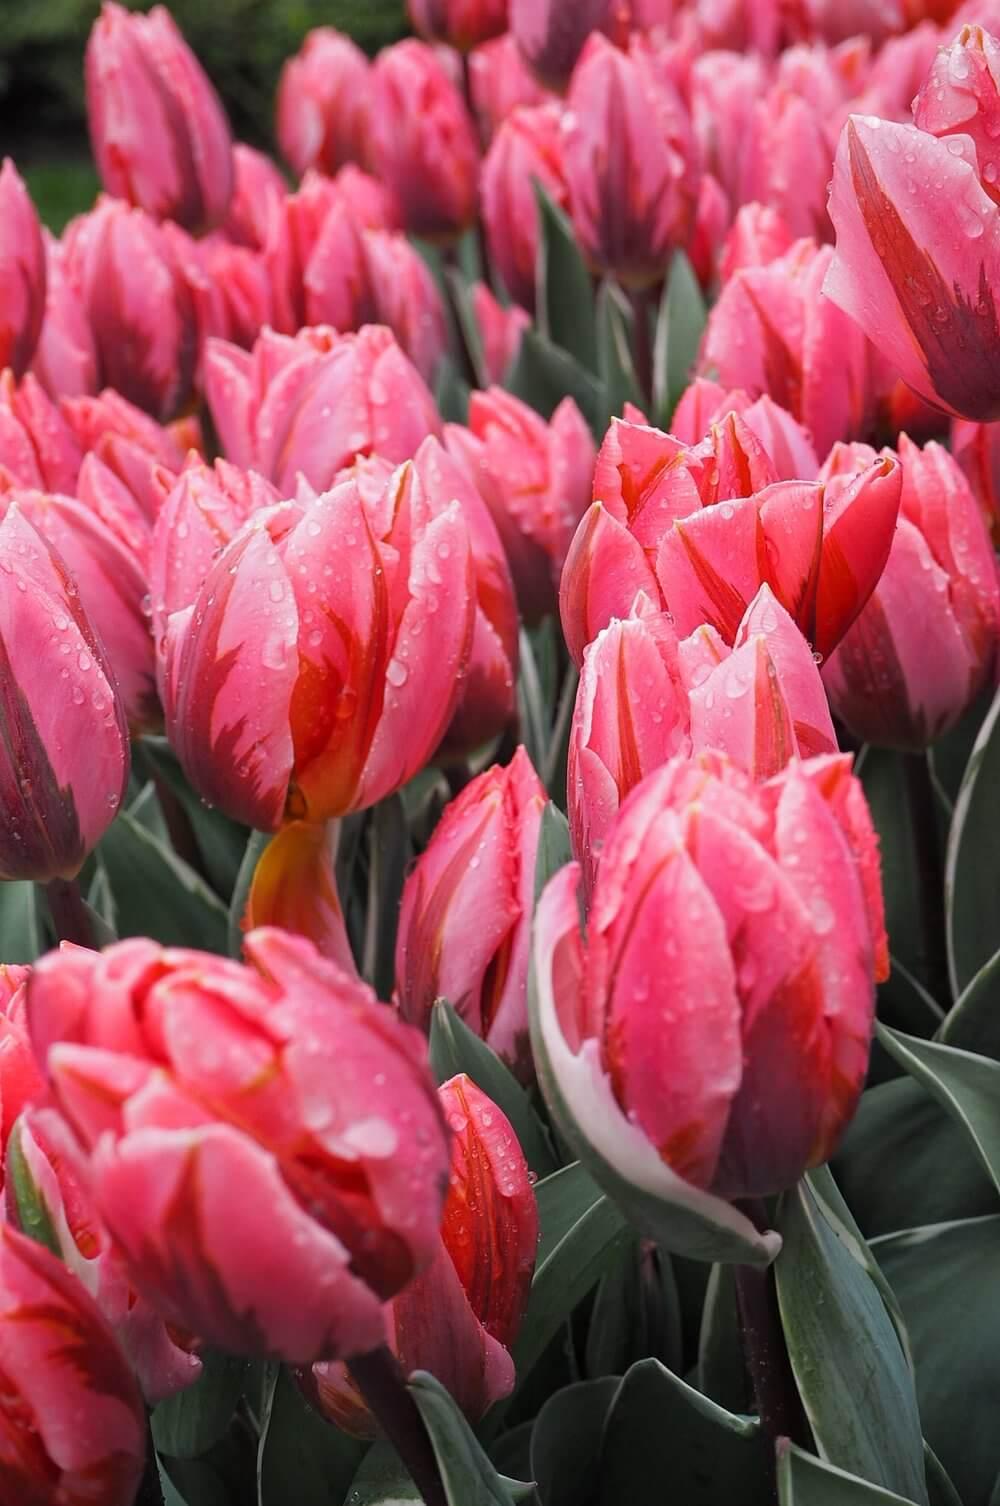 fuscia_pink_rain_soaked_tulips_keukenhof